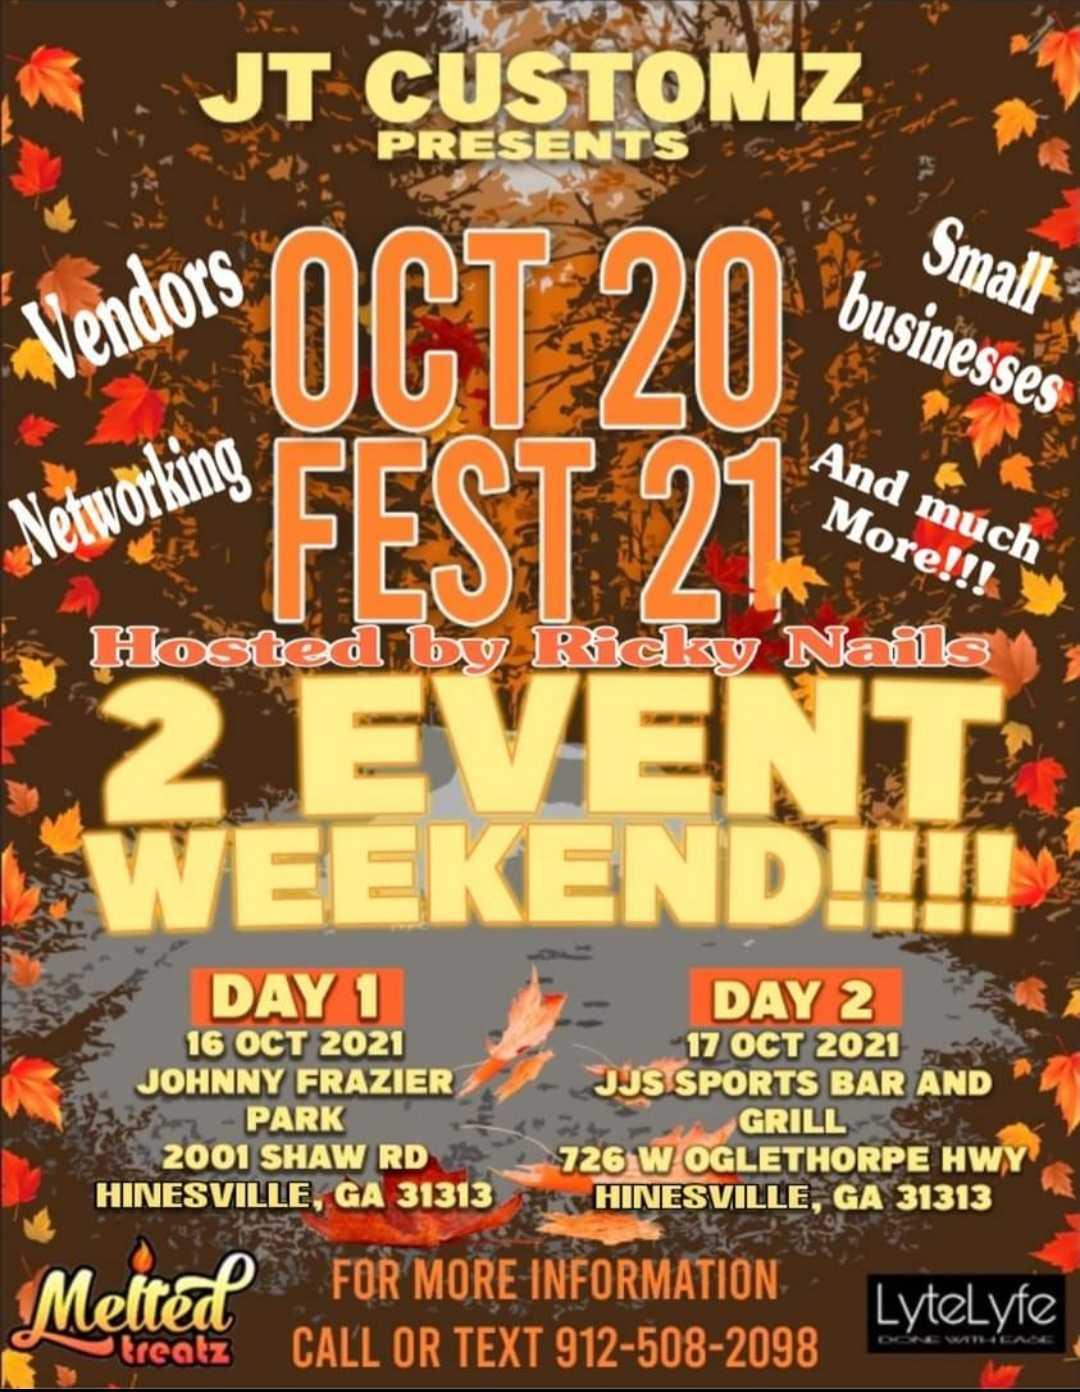 JT Customz October Fest